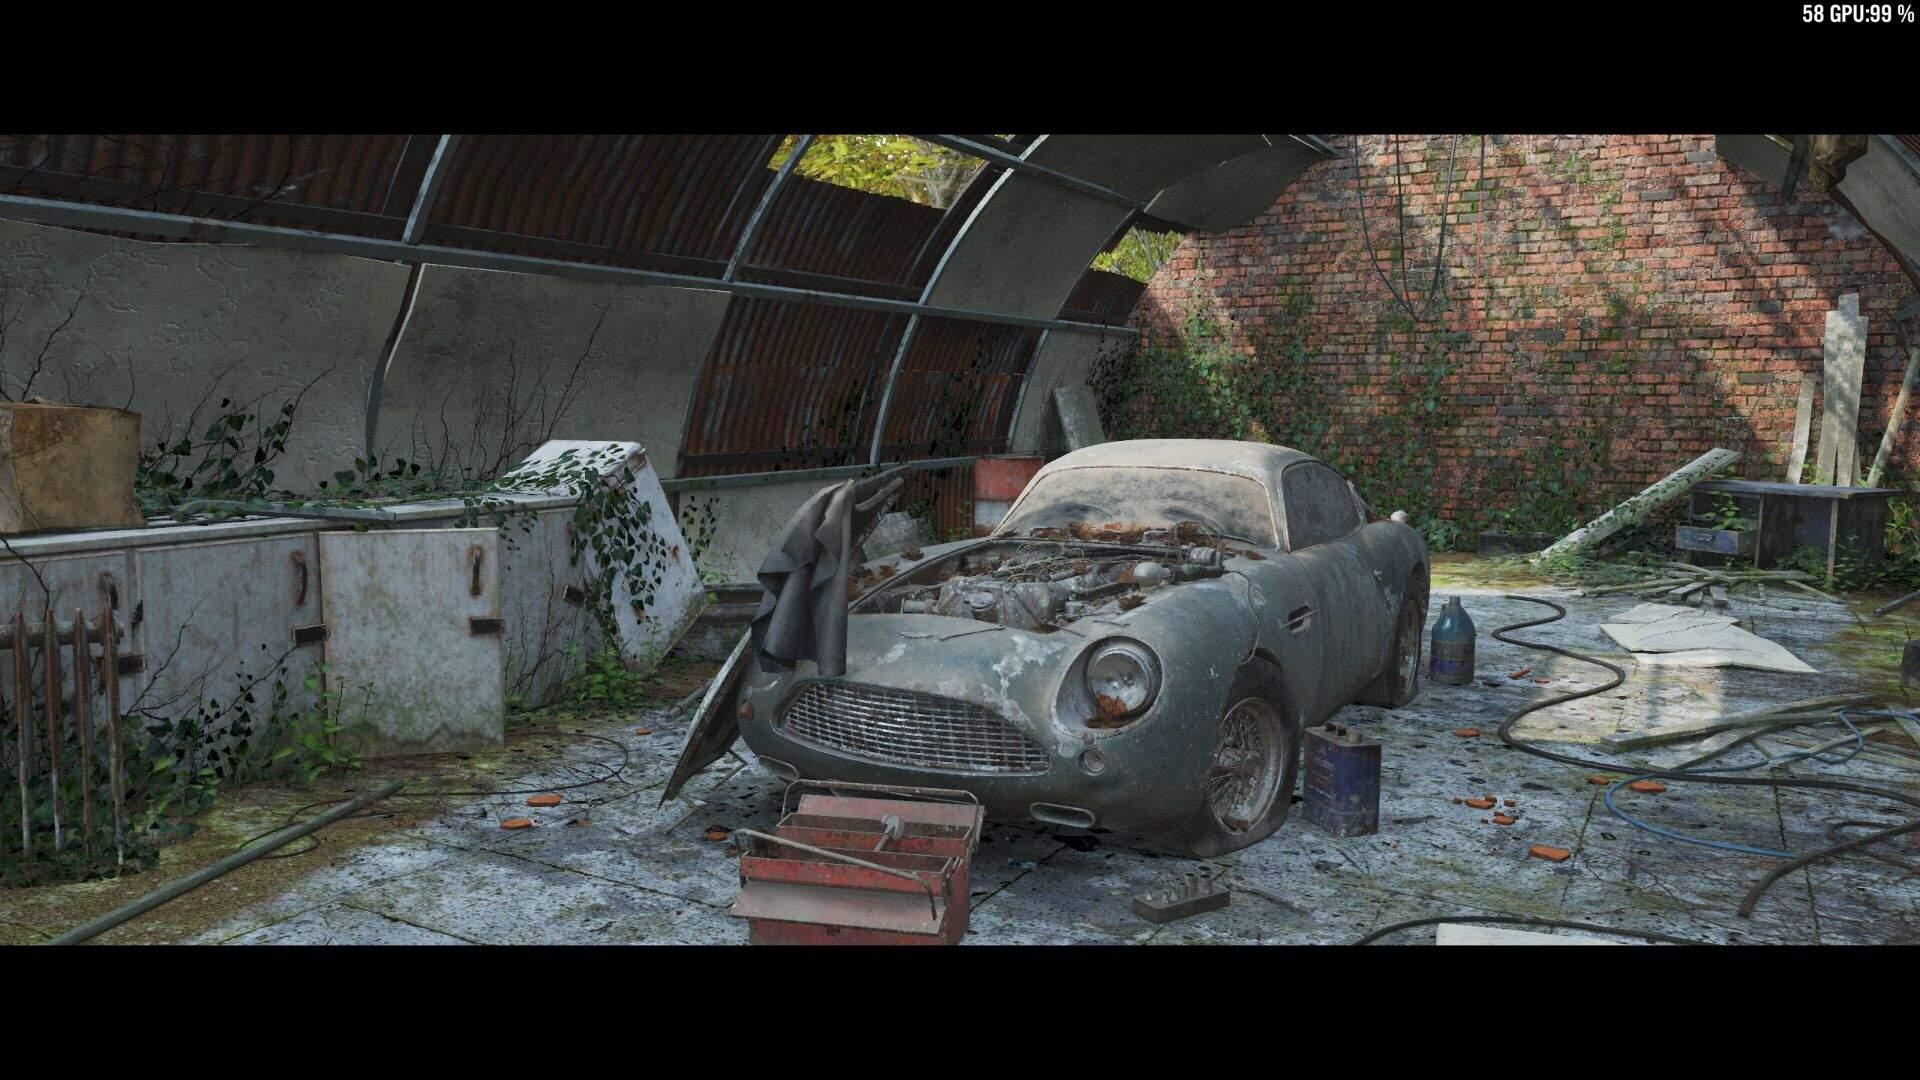 Forza horizon 4 Aston Martin DB4 GT Zagato Scheunenfund